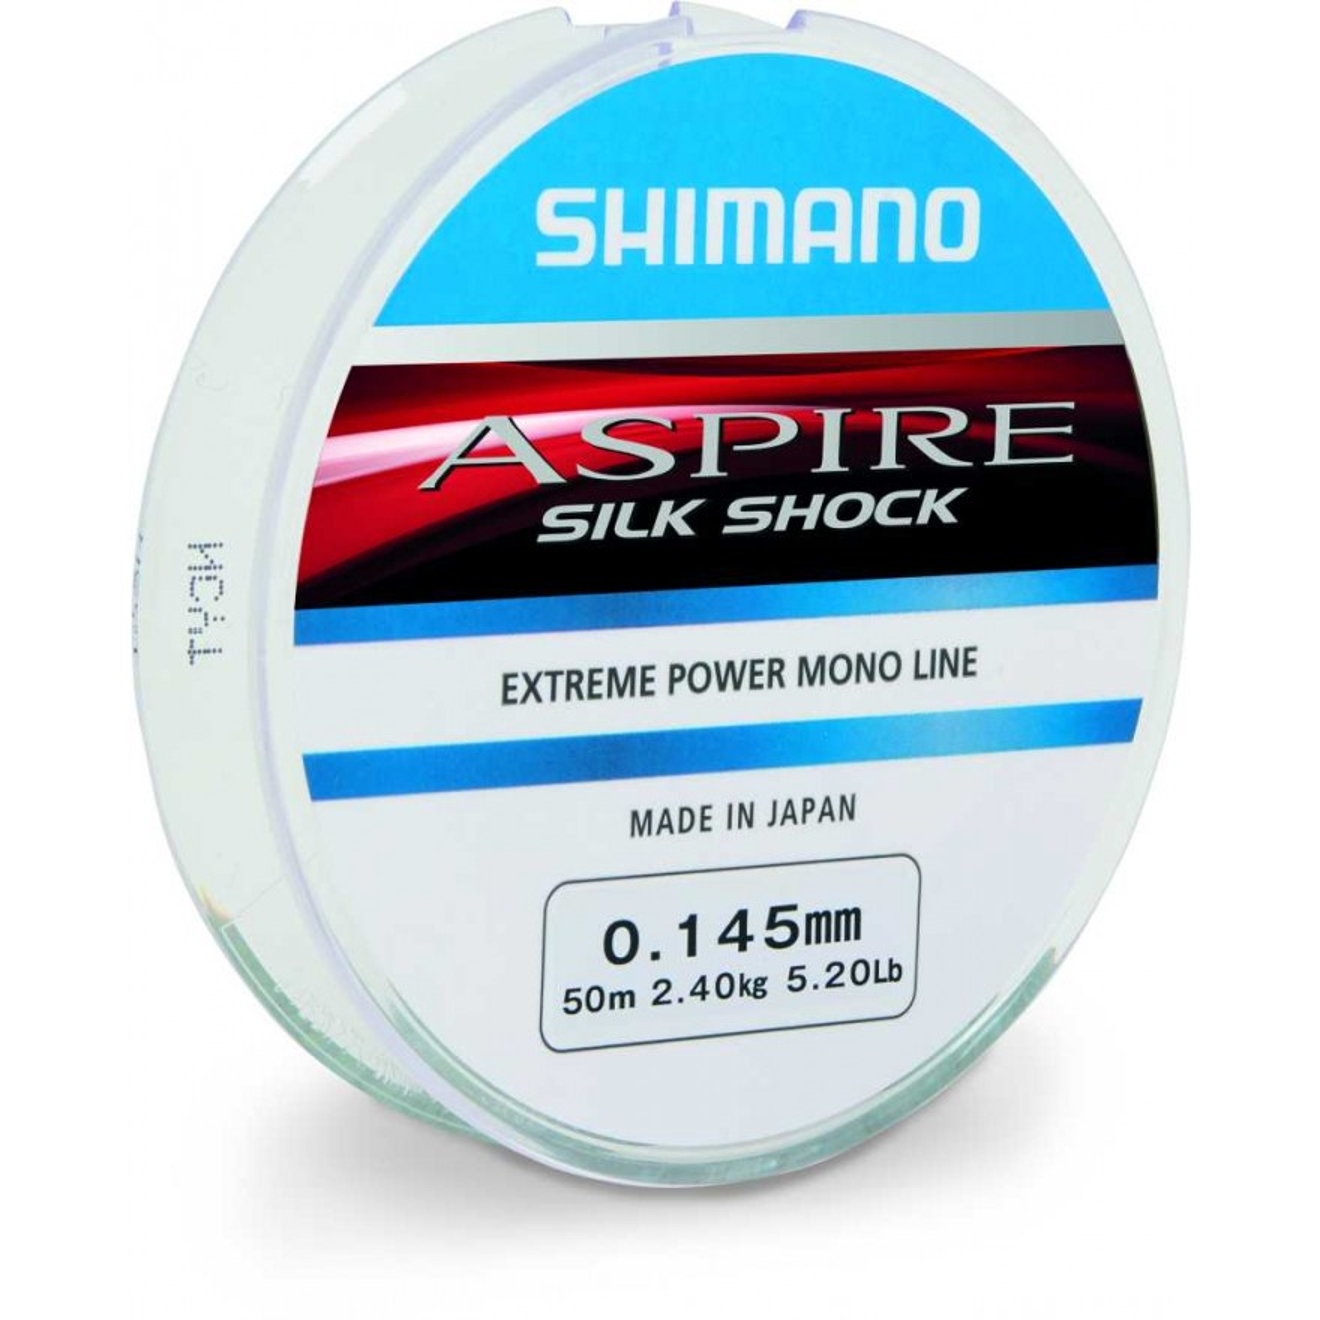 0.165mm Shimano Aspire Silk Shock Rig Line 50m All Sizes-